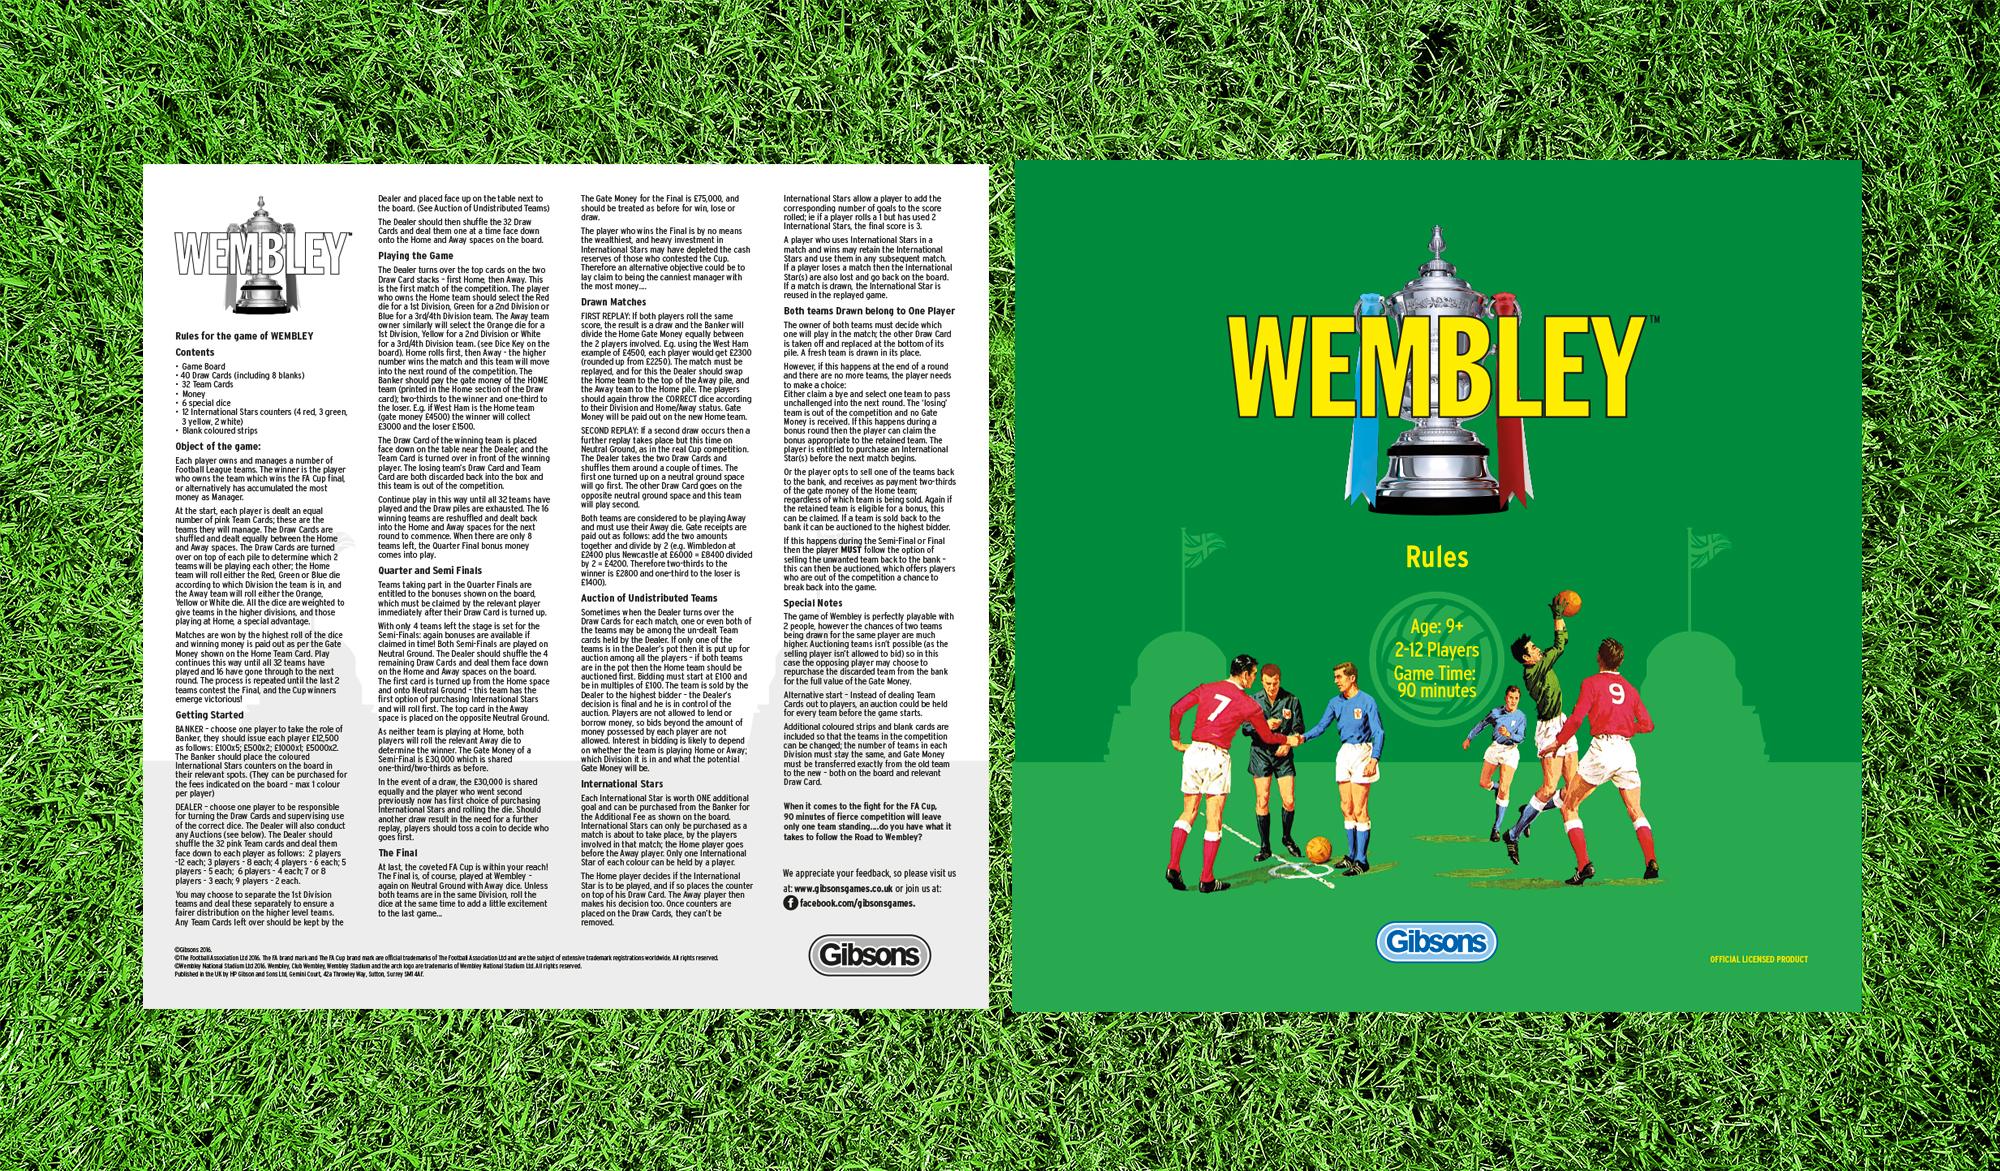 Wembley rules